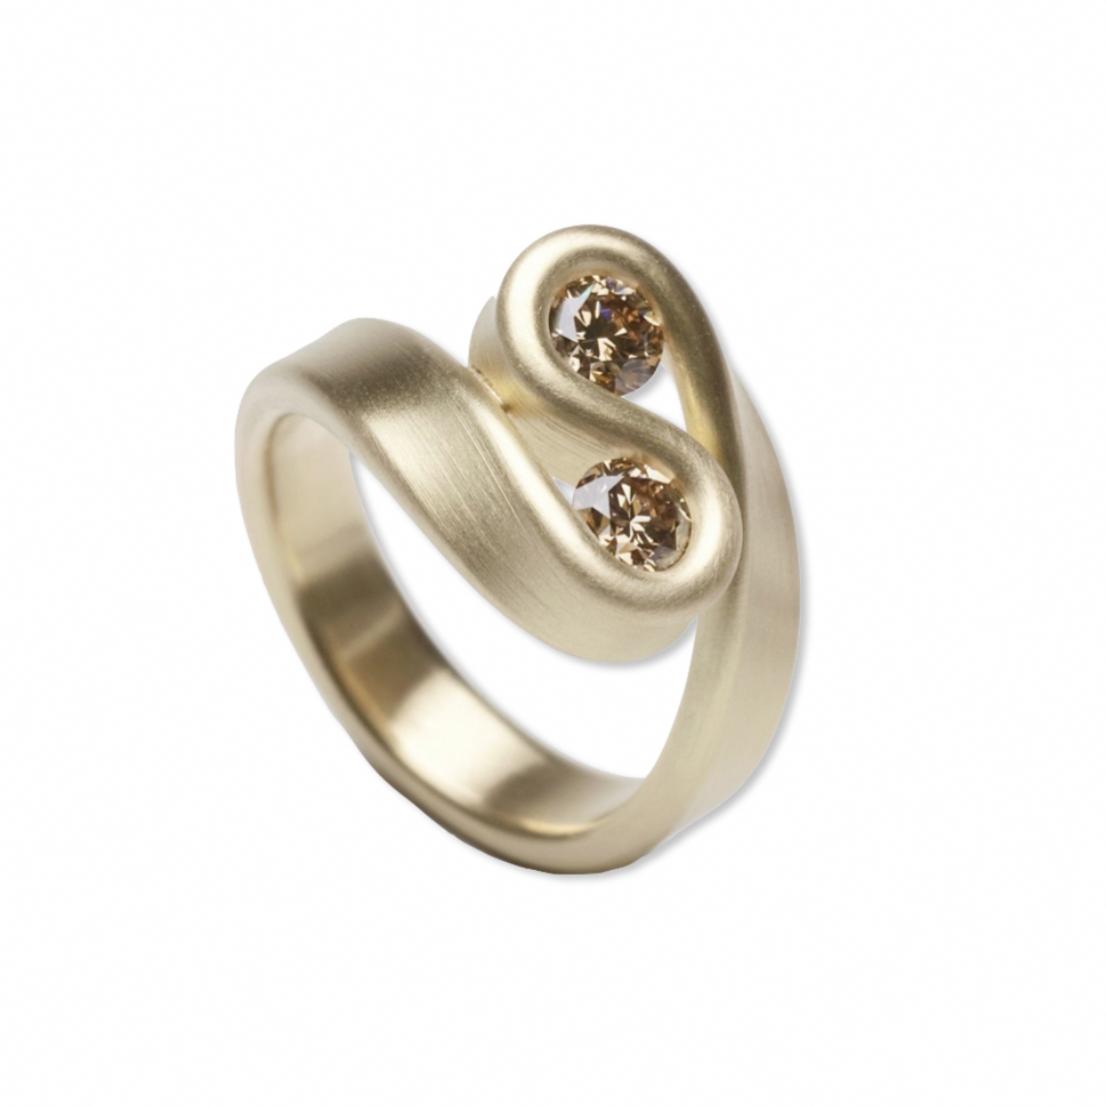 Leen heyne gold u diamond duett ring orro contemporary jewellery